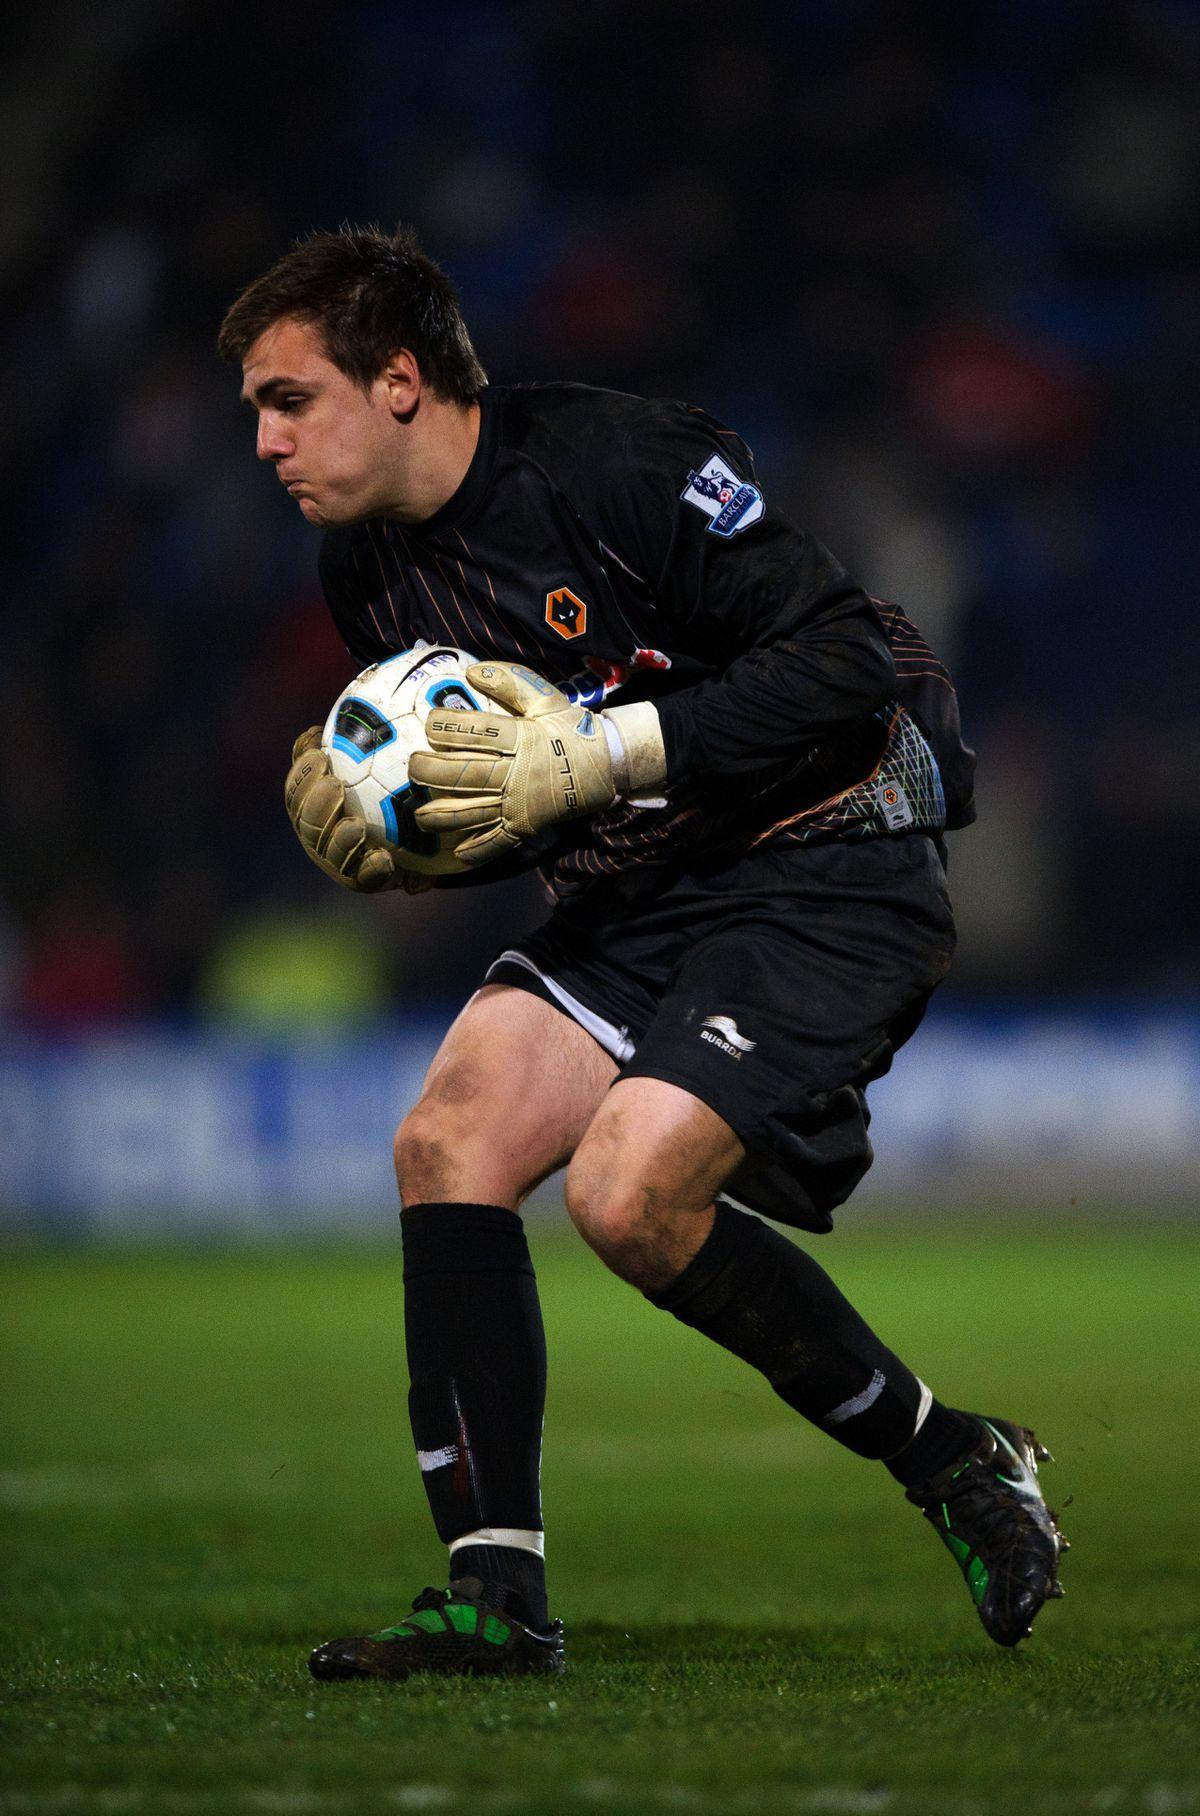 Daniel East of Wolverhampton Wanderers